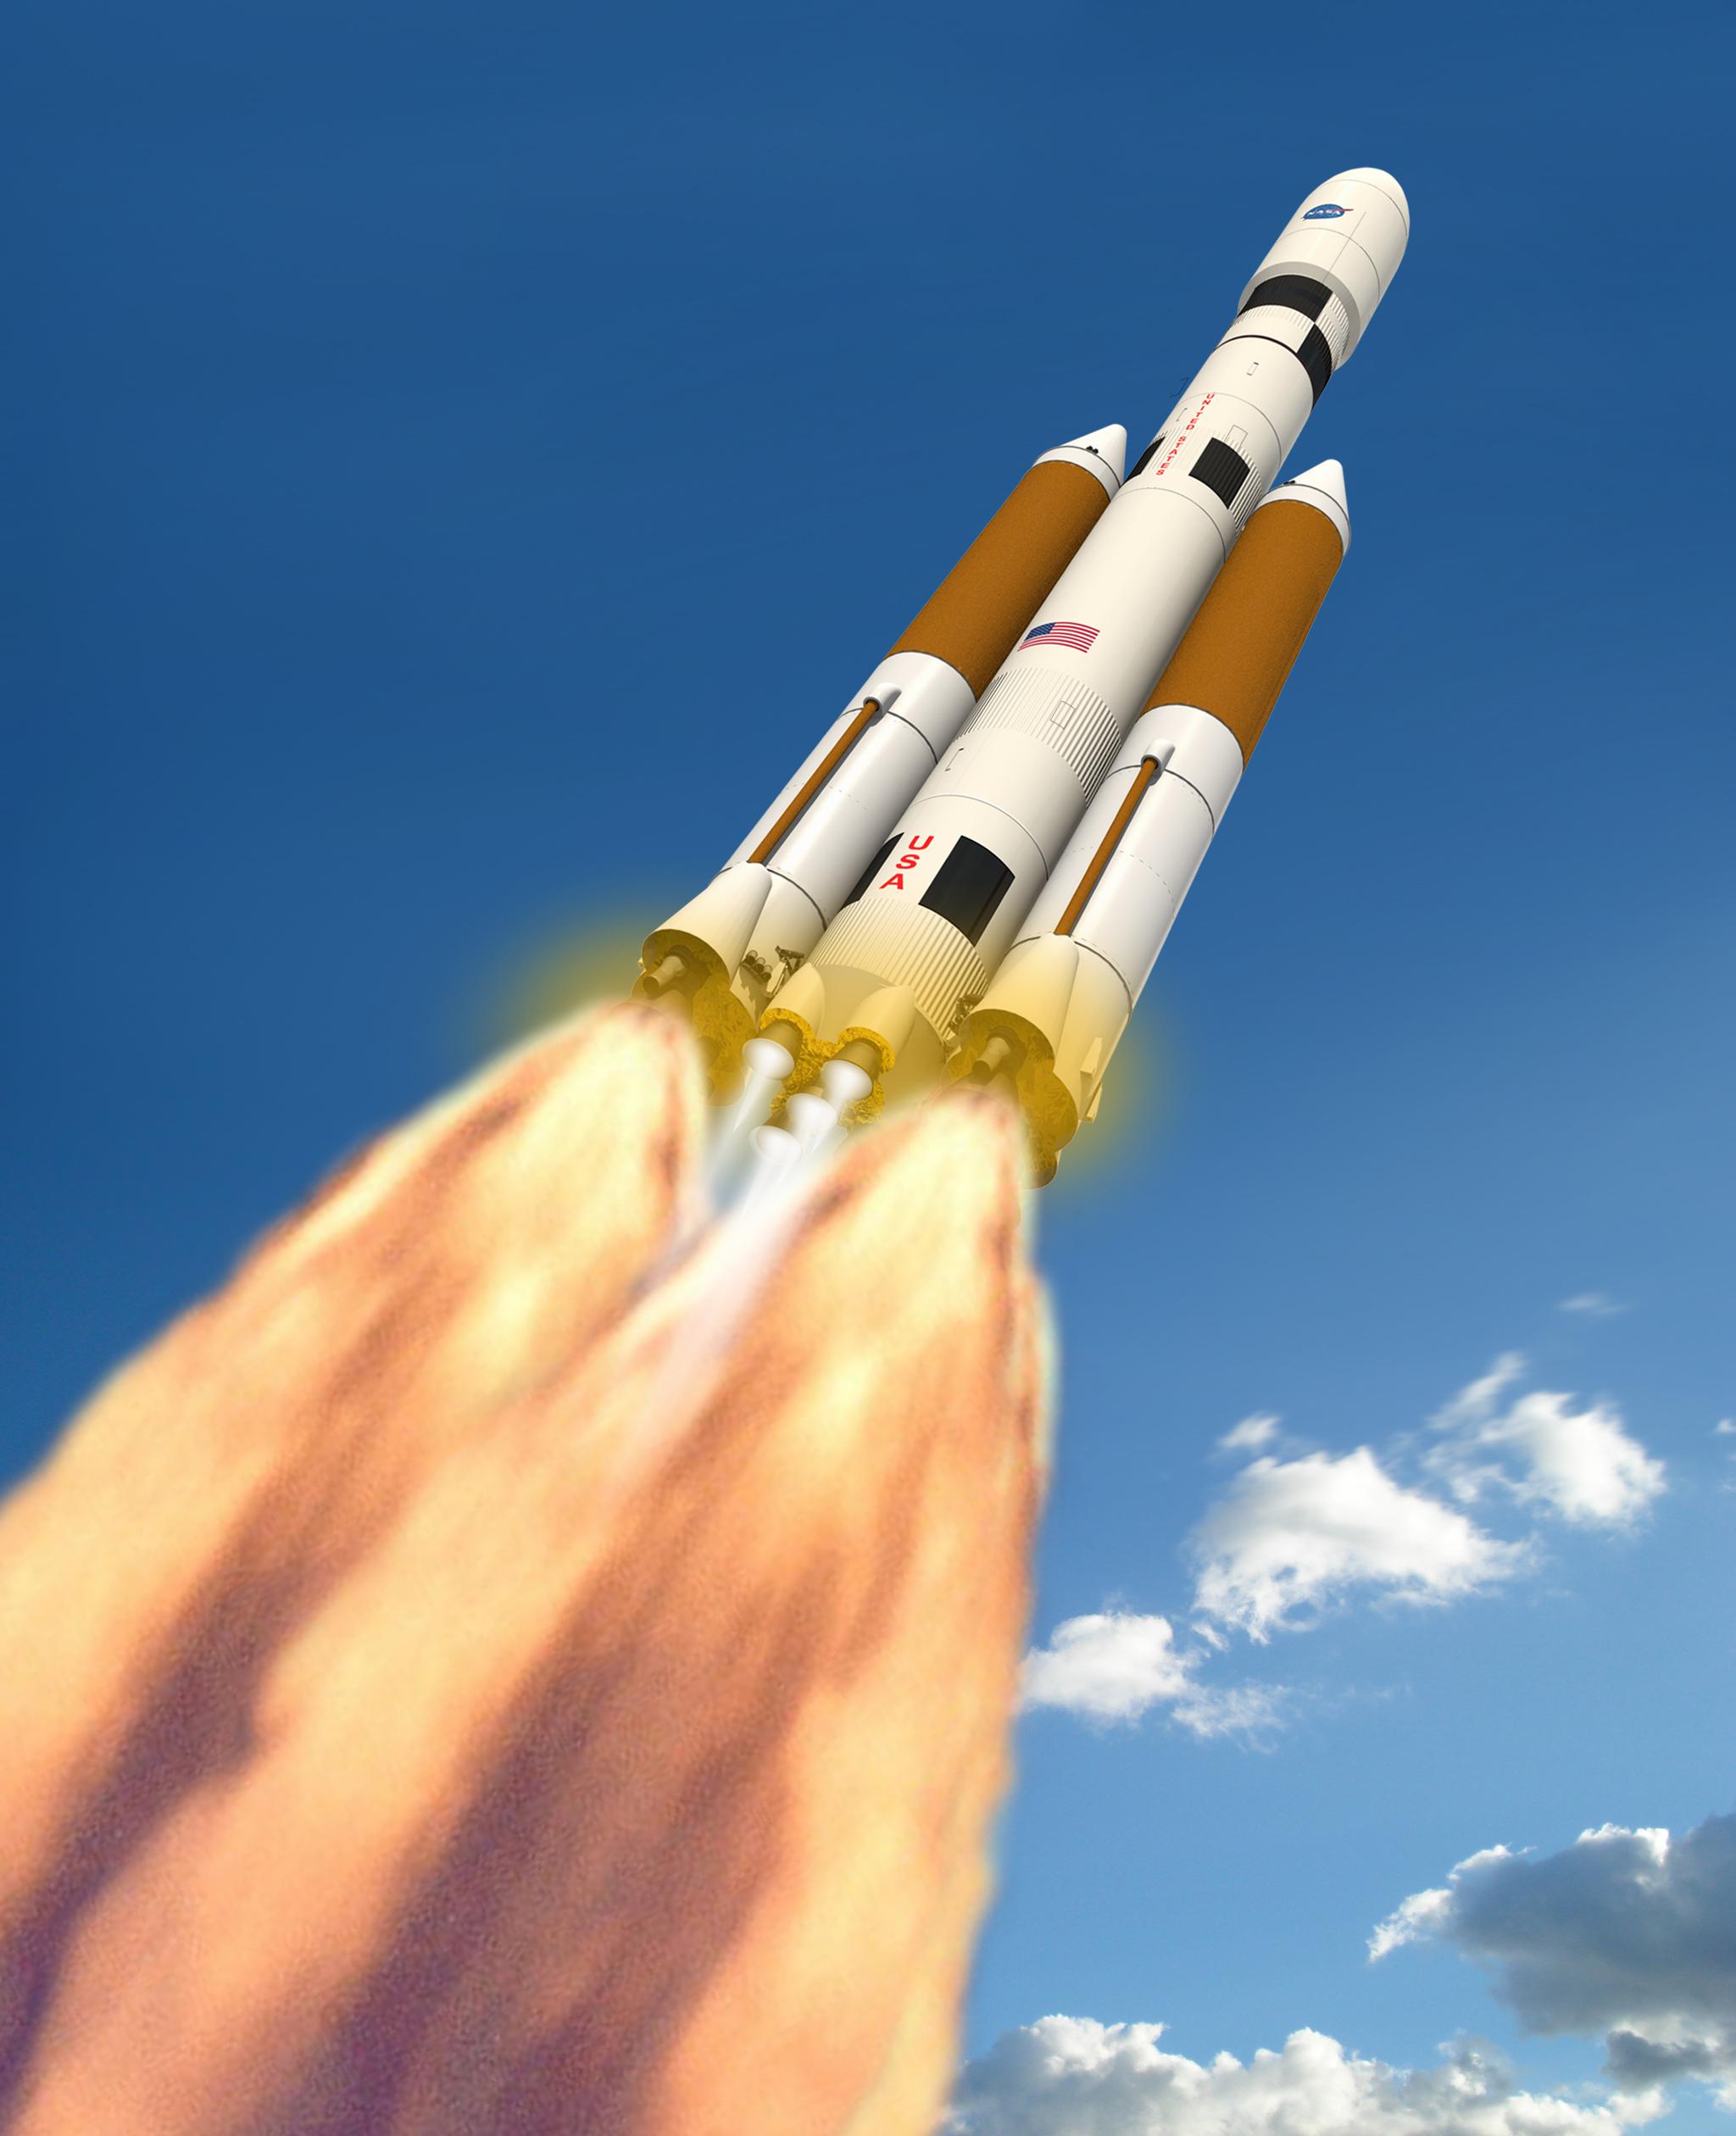 Boeing To Provide Interim Upper Stage for SLS - SpaceNews.com